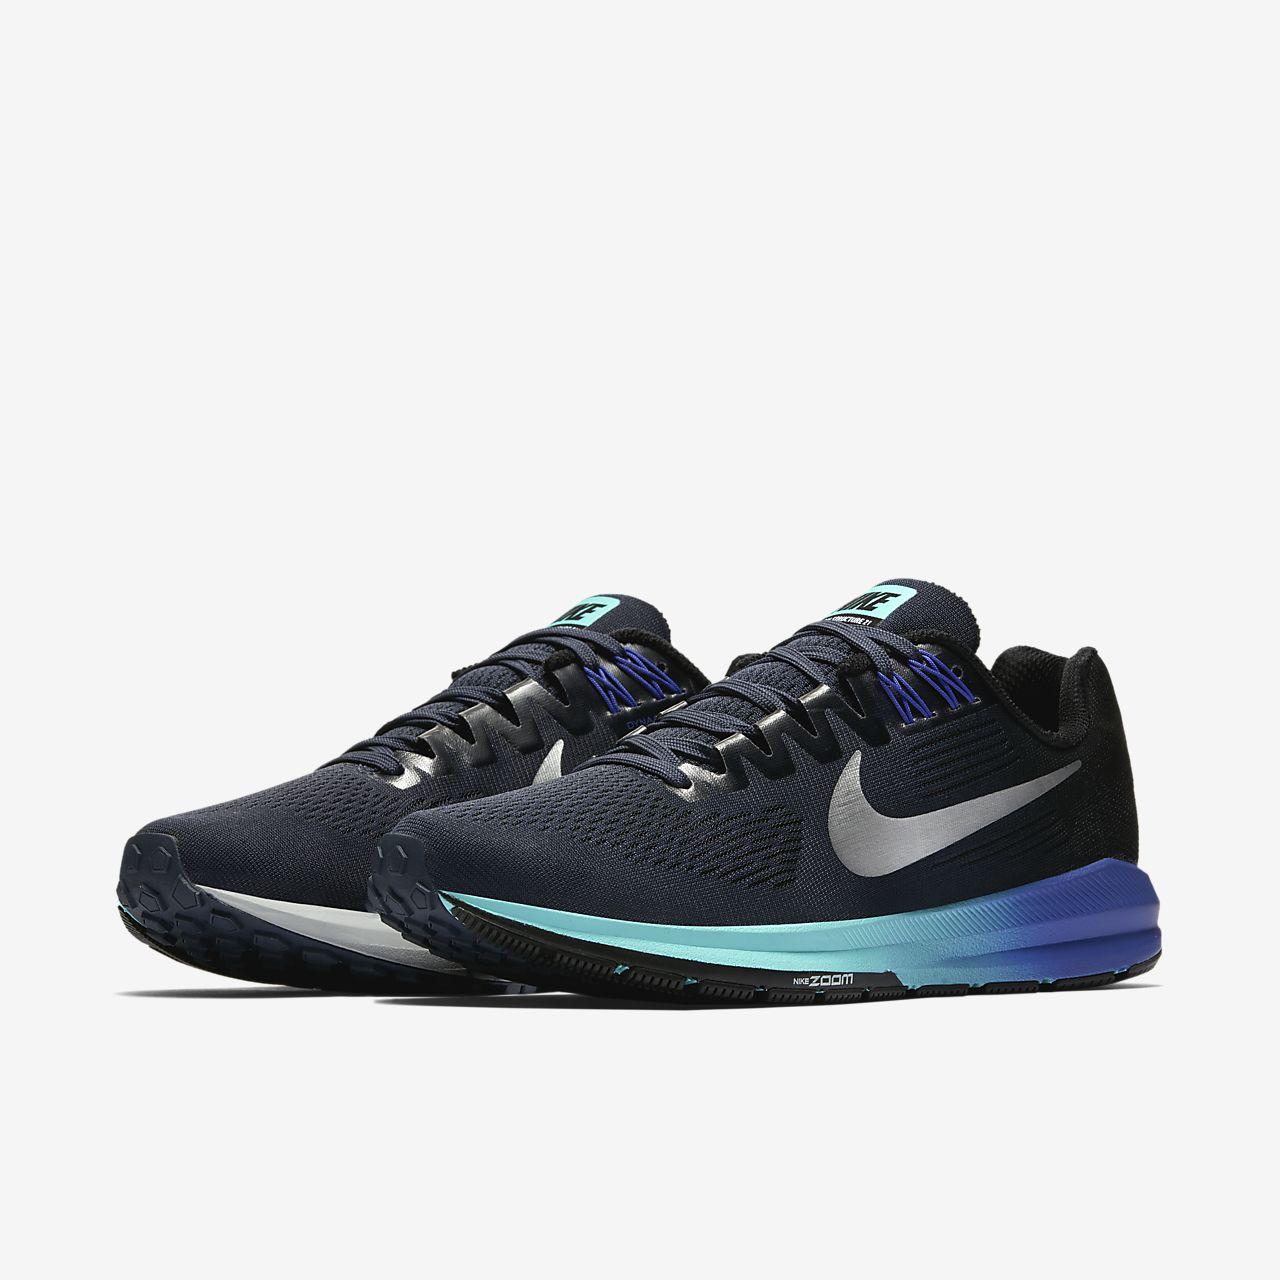 9354bd376c1c Nike Air Zoom Structure 21 Women s Running Shoe. Nike.com CA